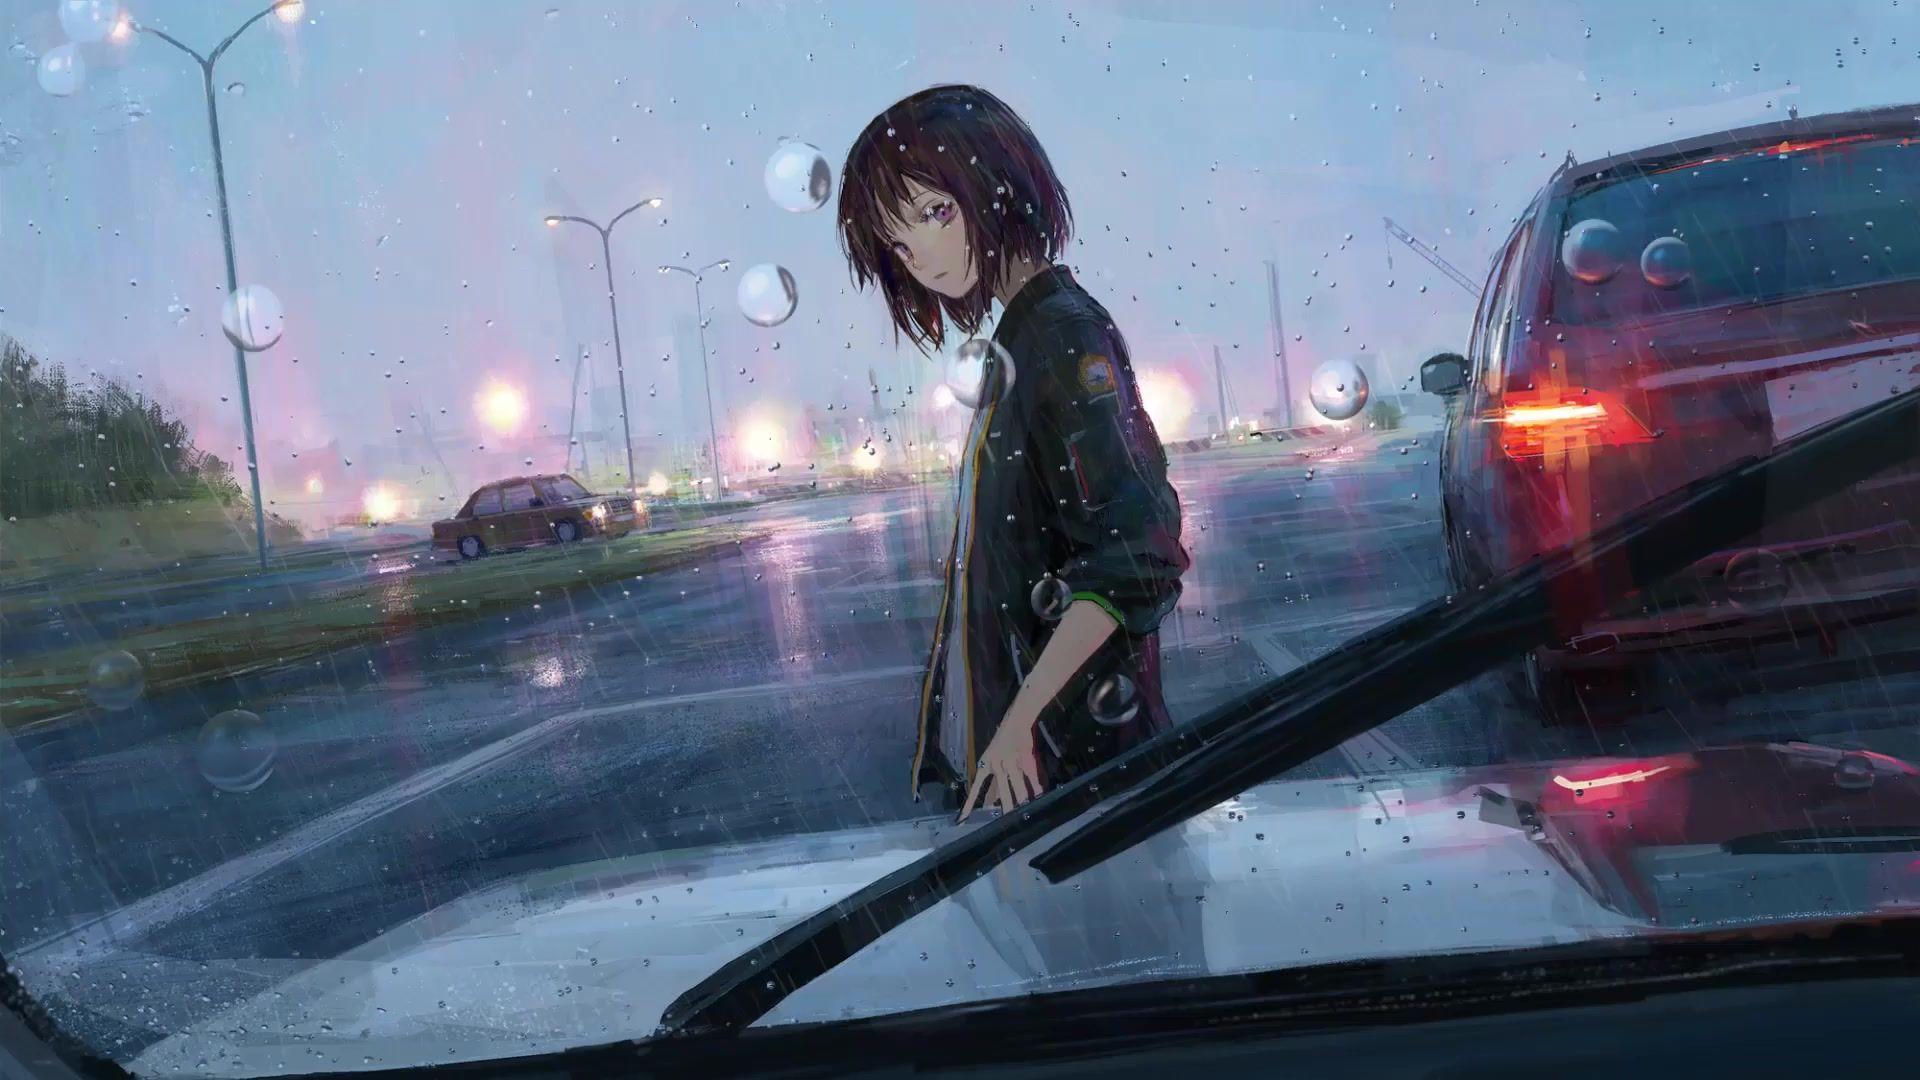 Free download Rainfall Girl Anime Live Wallpaper ...